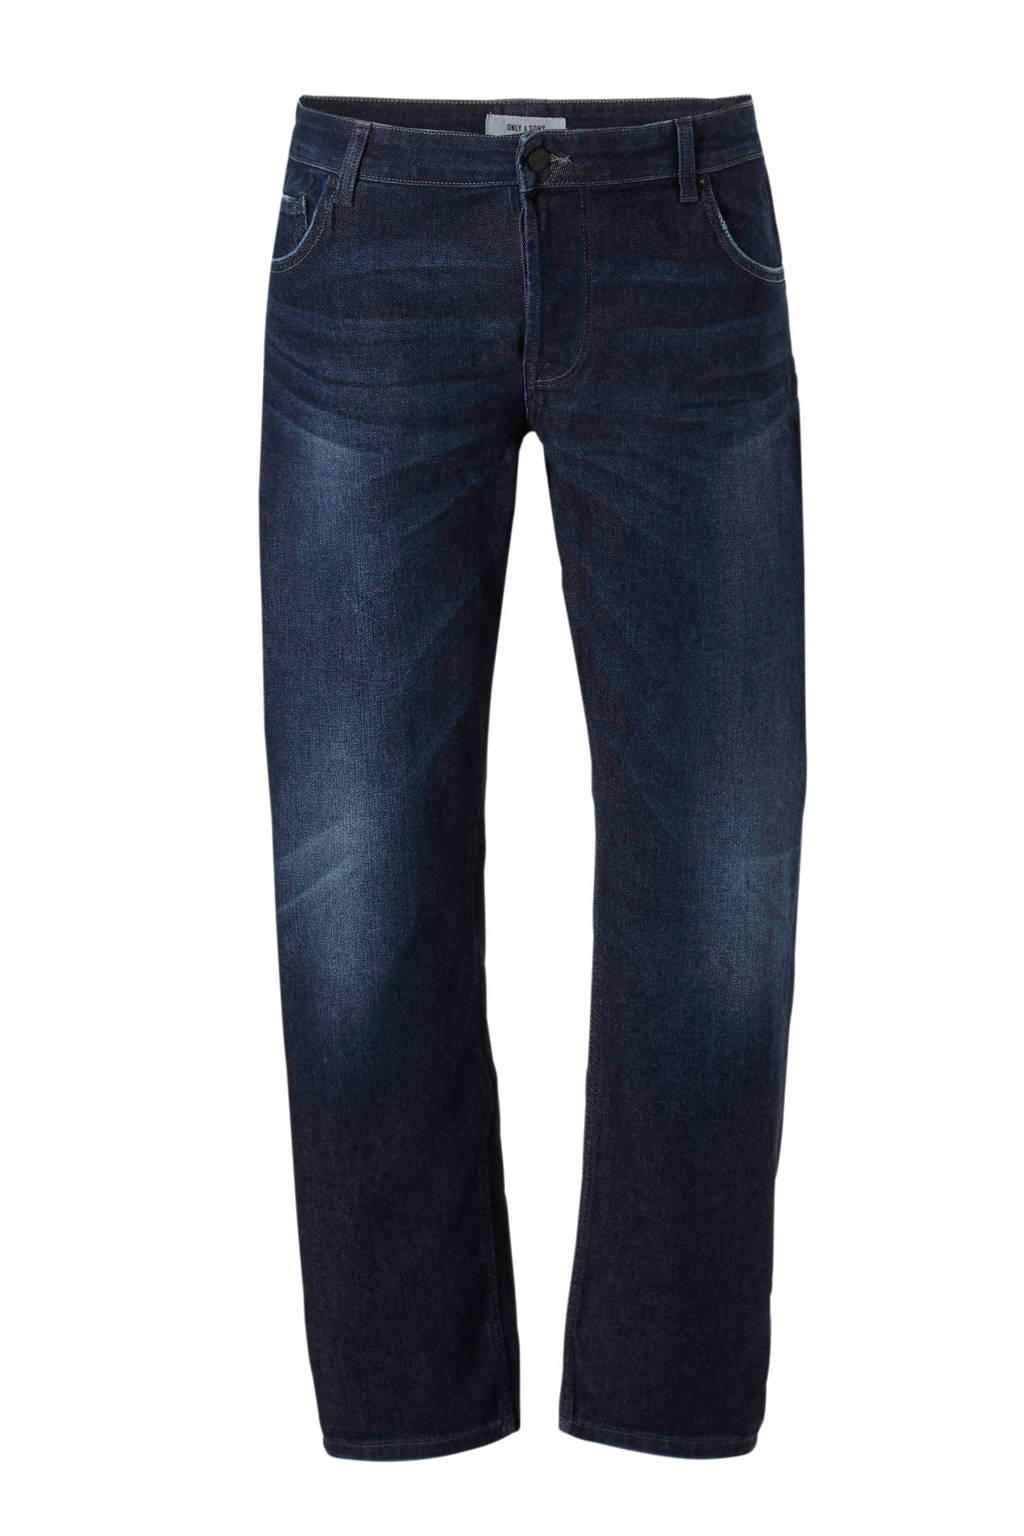 Only & Sons PLUS slim fit jeans, Dark denim